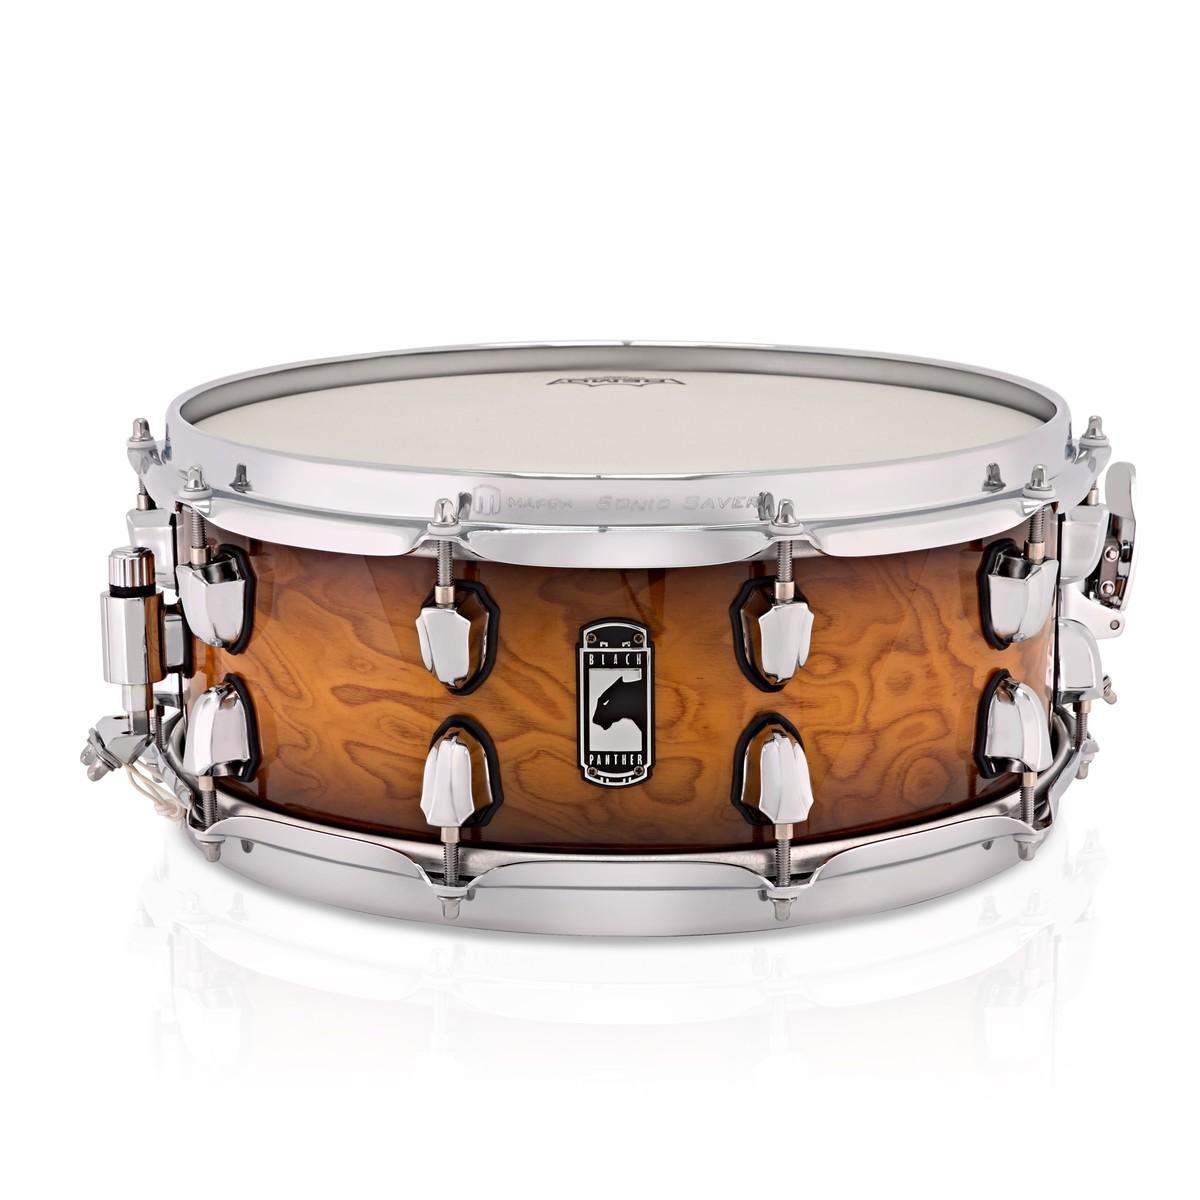 mapex black panther 39 the velvetone 39 14 x 5 5 maple walnut snare drum at gear4music. Black Bedroom Furniture Sets. Home Design Ideas